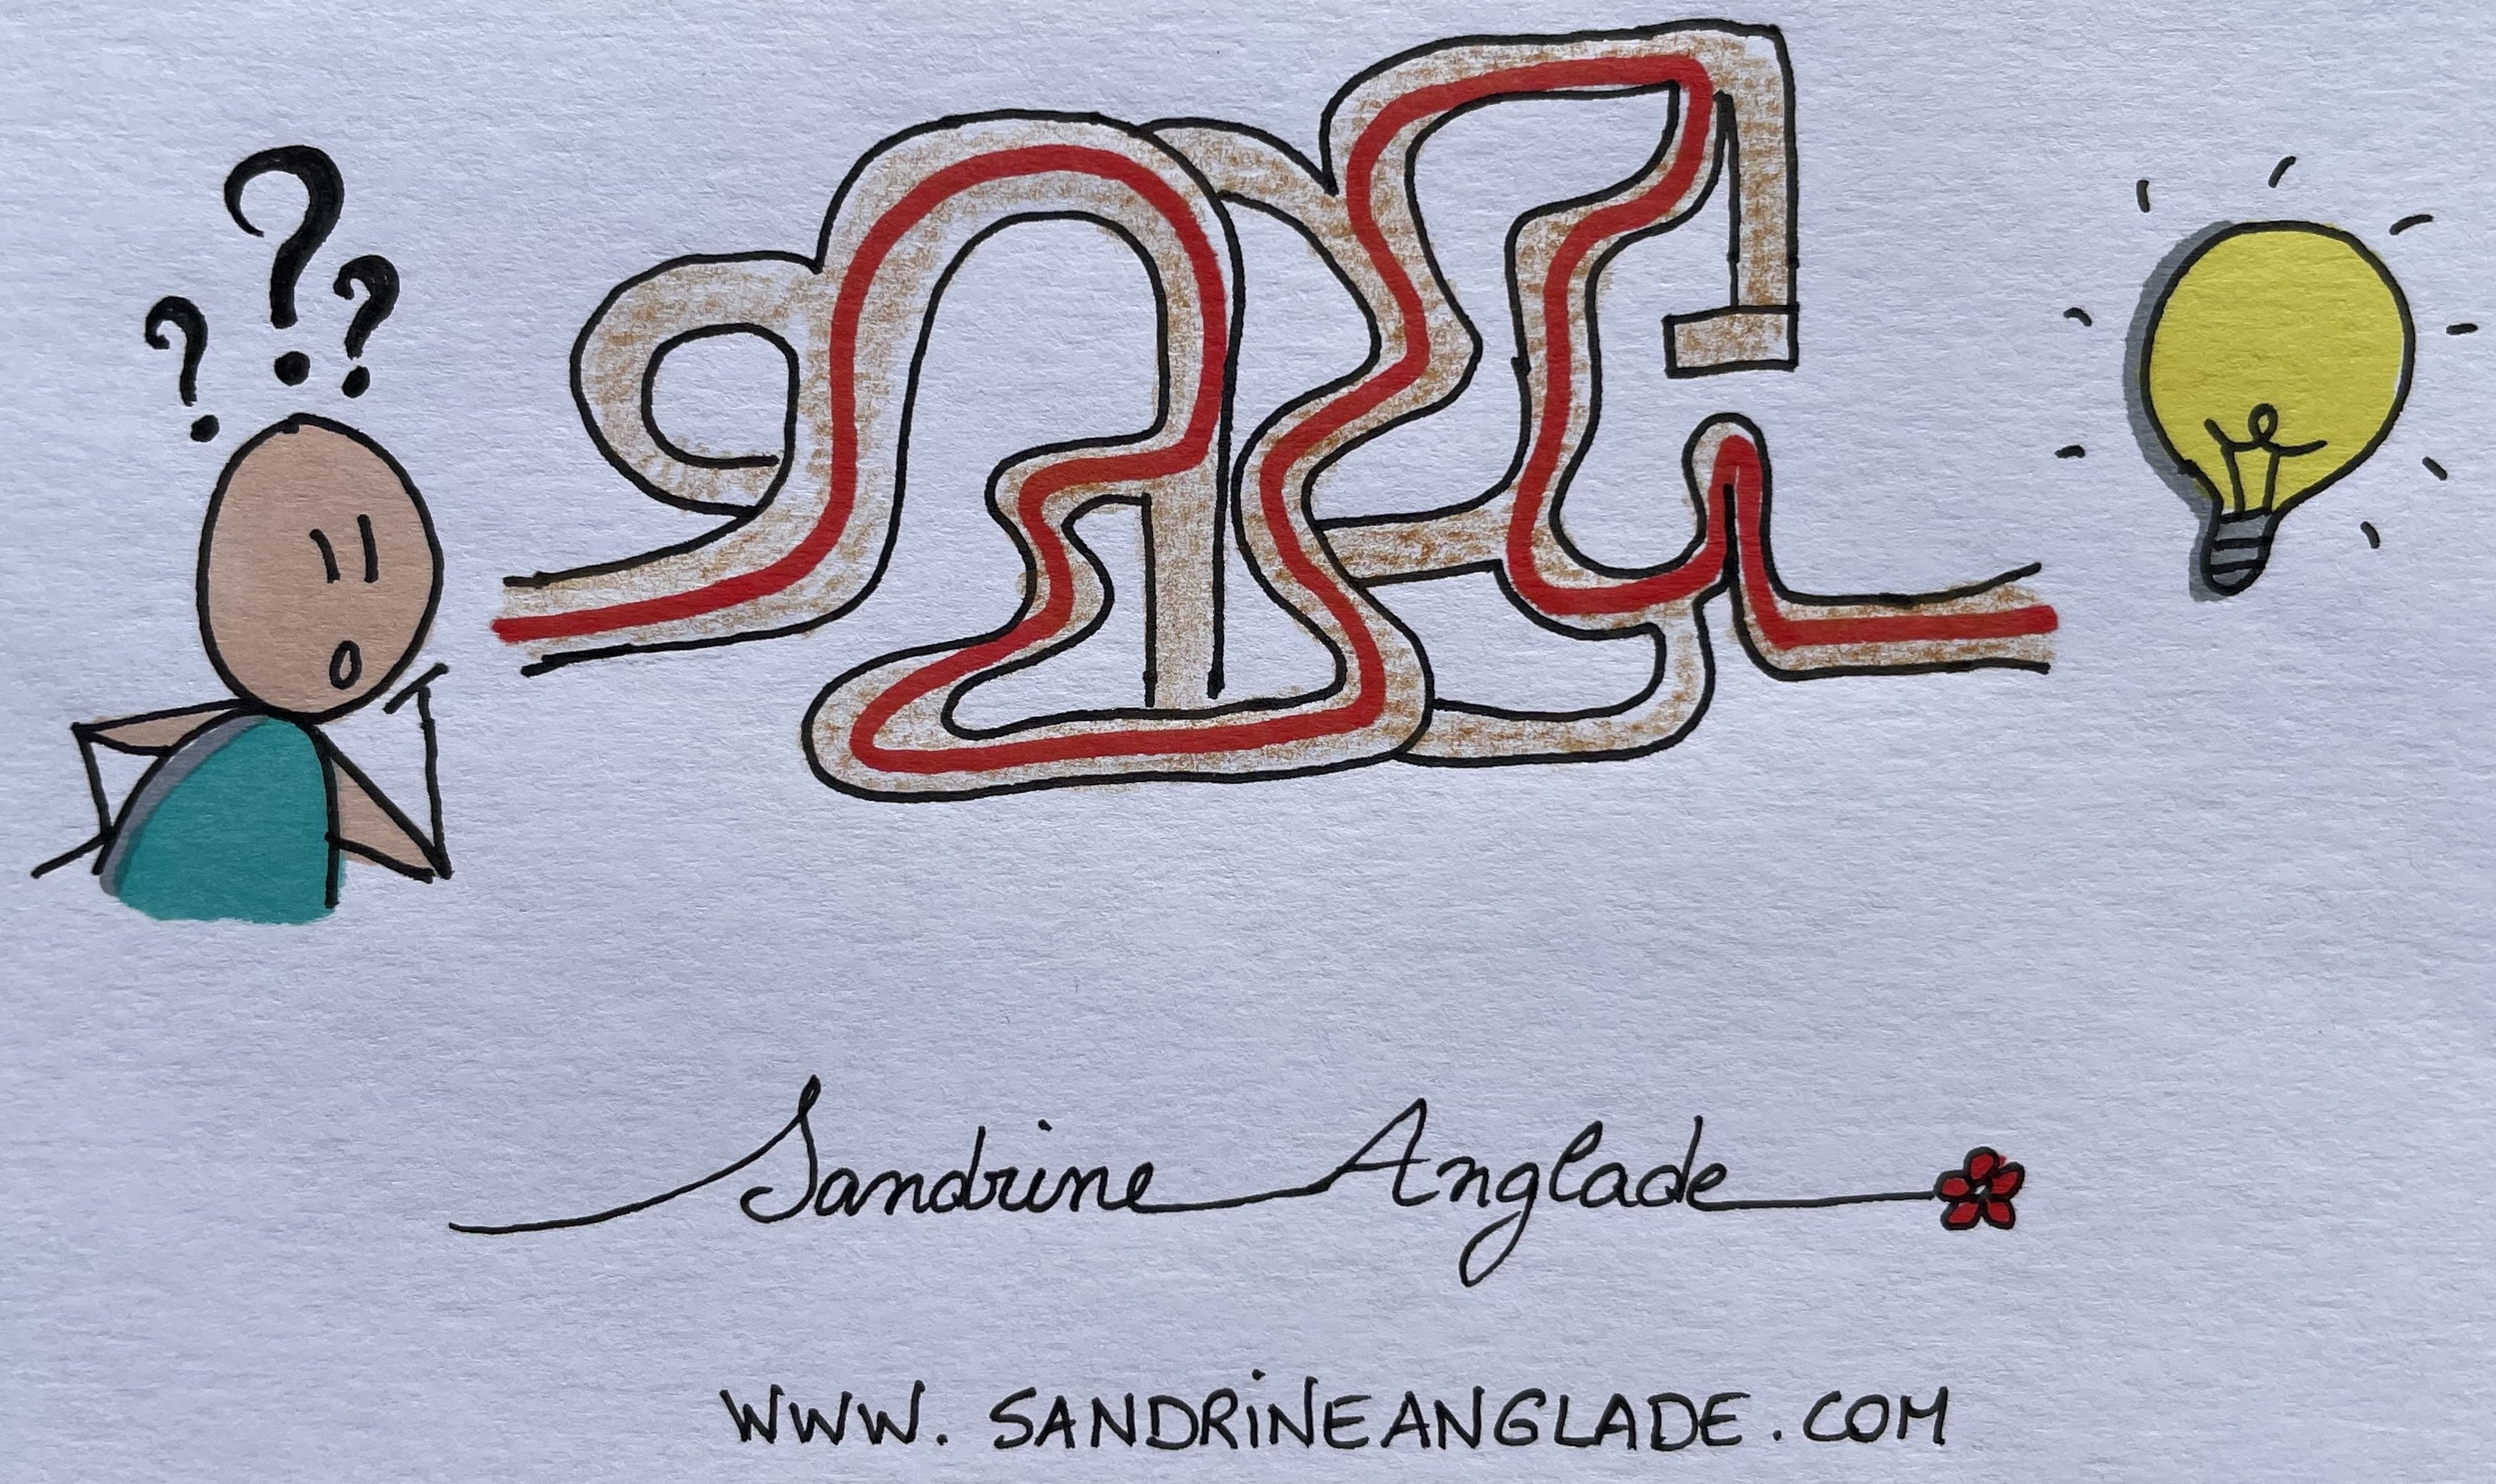 labyrinthe claudia eusebio sandrine anglade